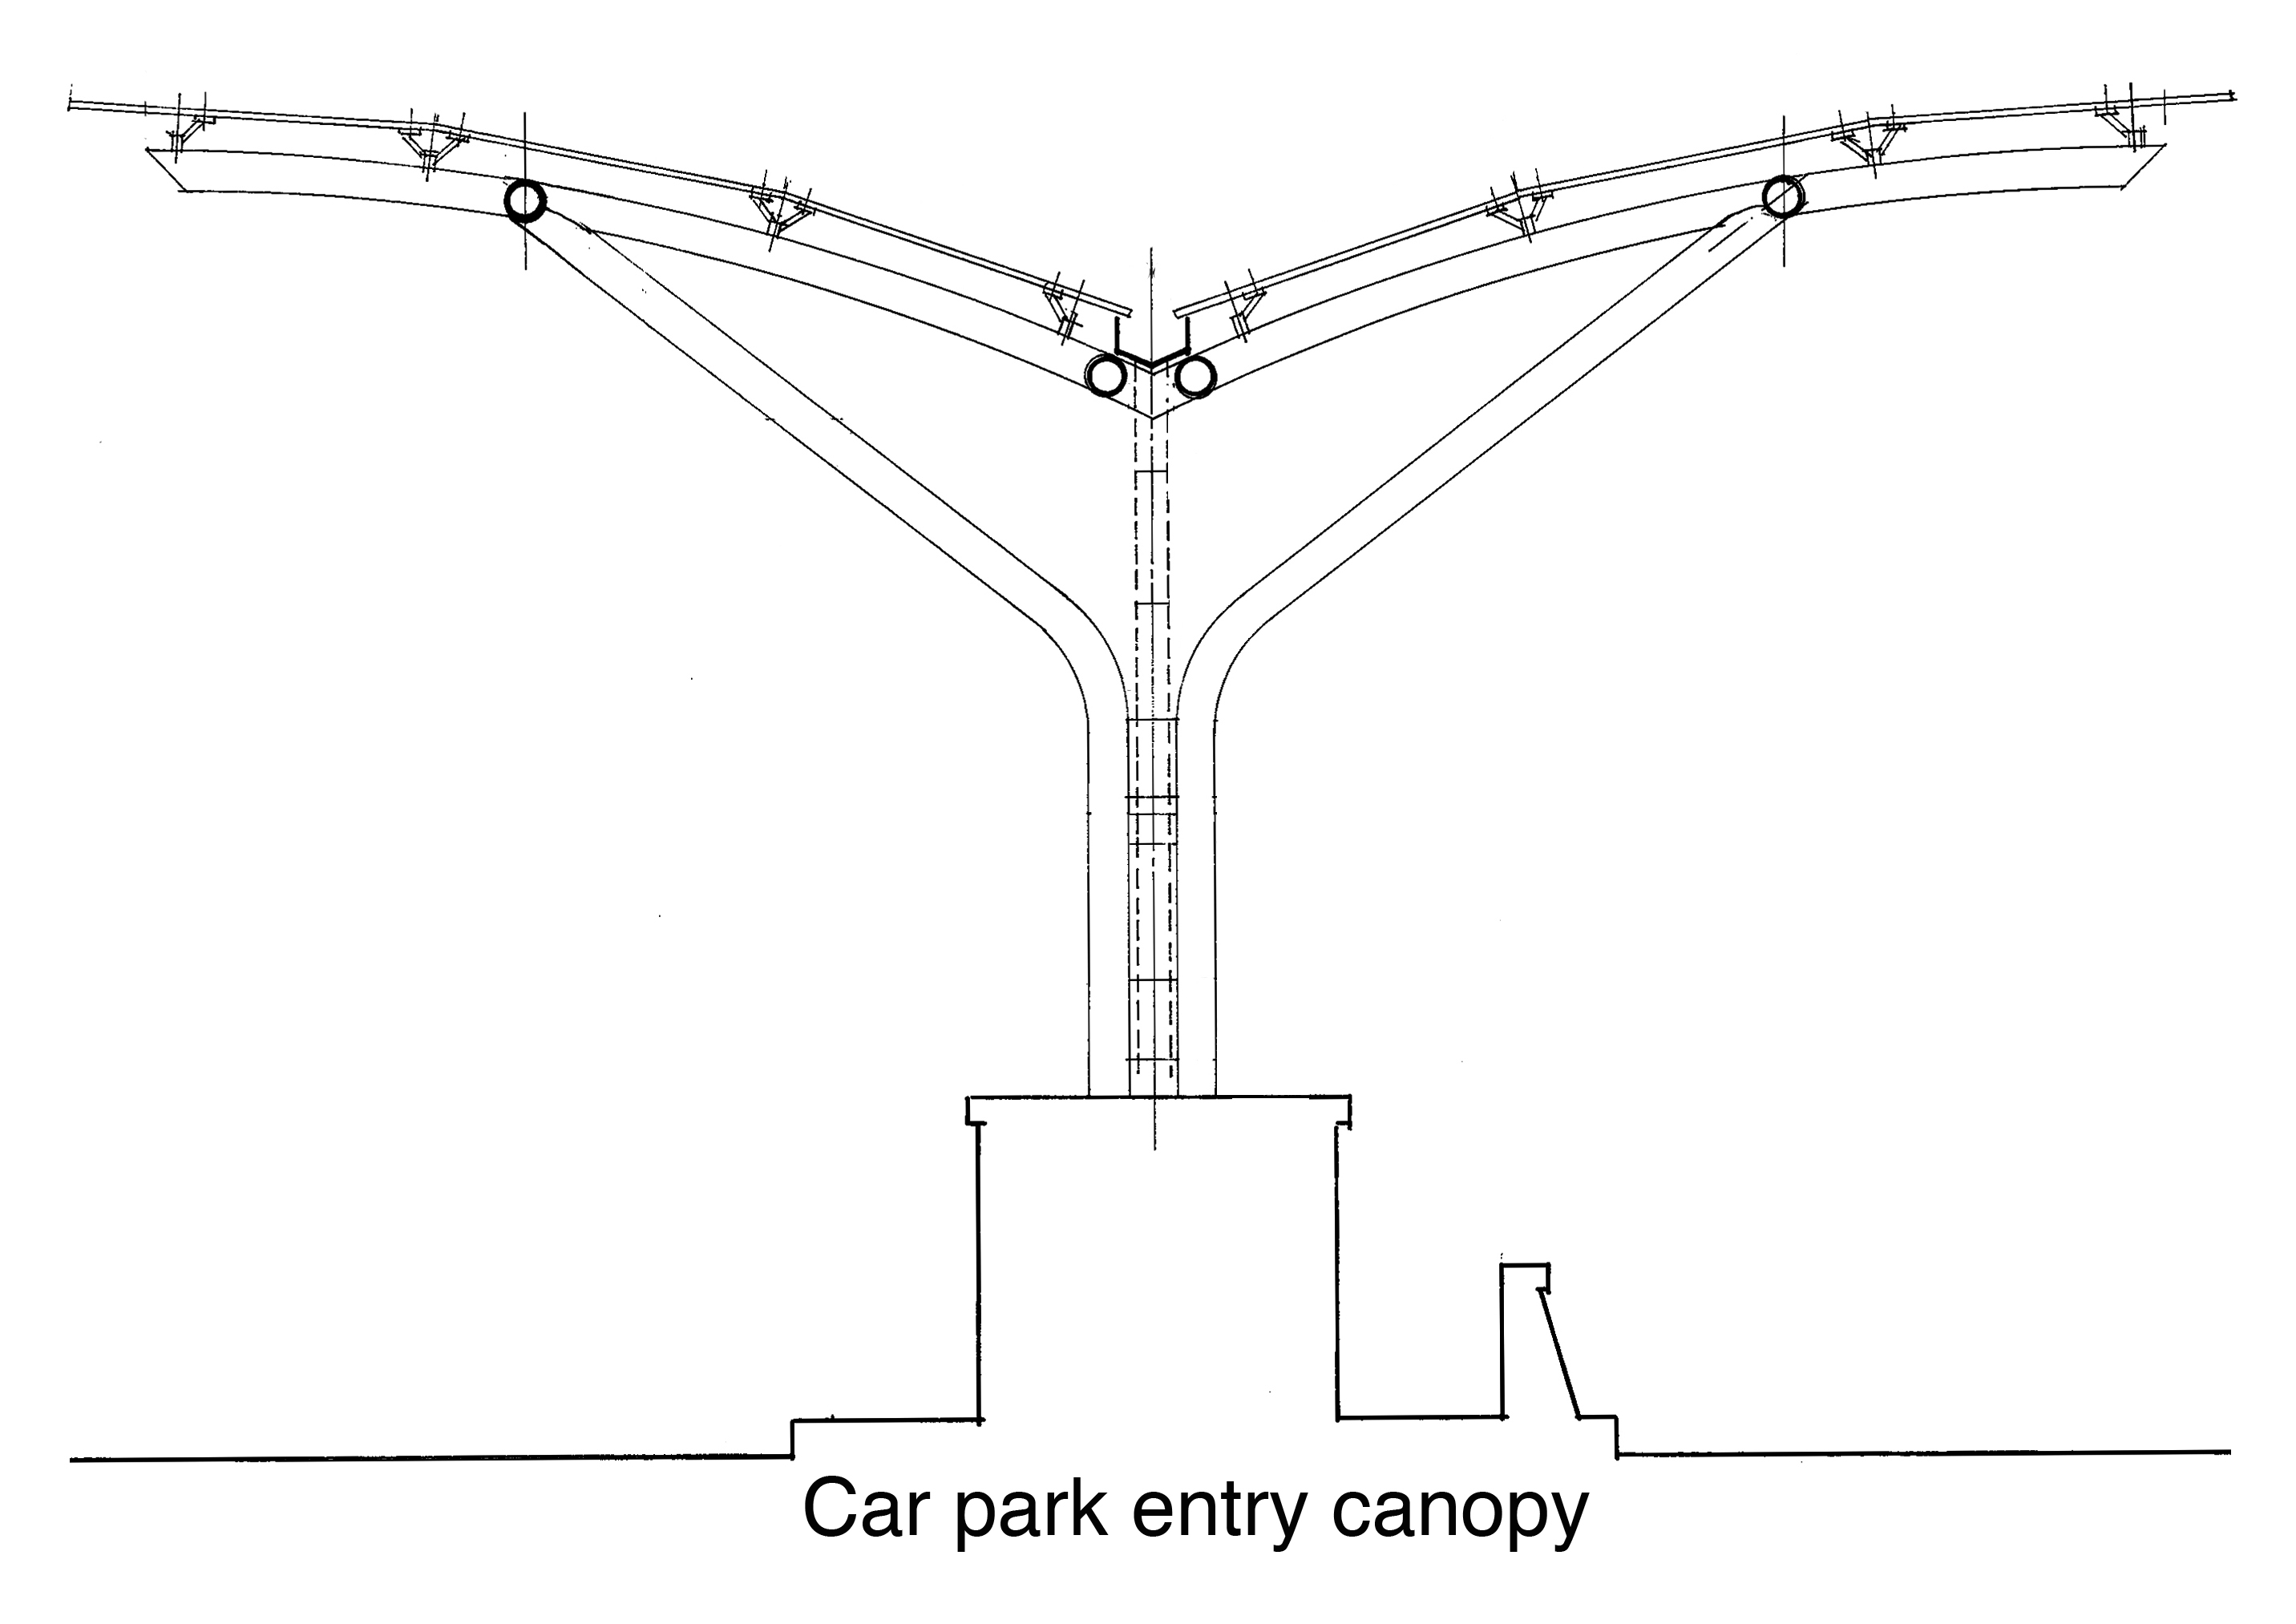 Capitalizing ...  sc 1 st  Sketchingjourneyu0027s Blog & Canopies Variation on a Theme Part 2 | Sketchingjourneyu0027s Blog